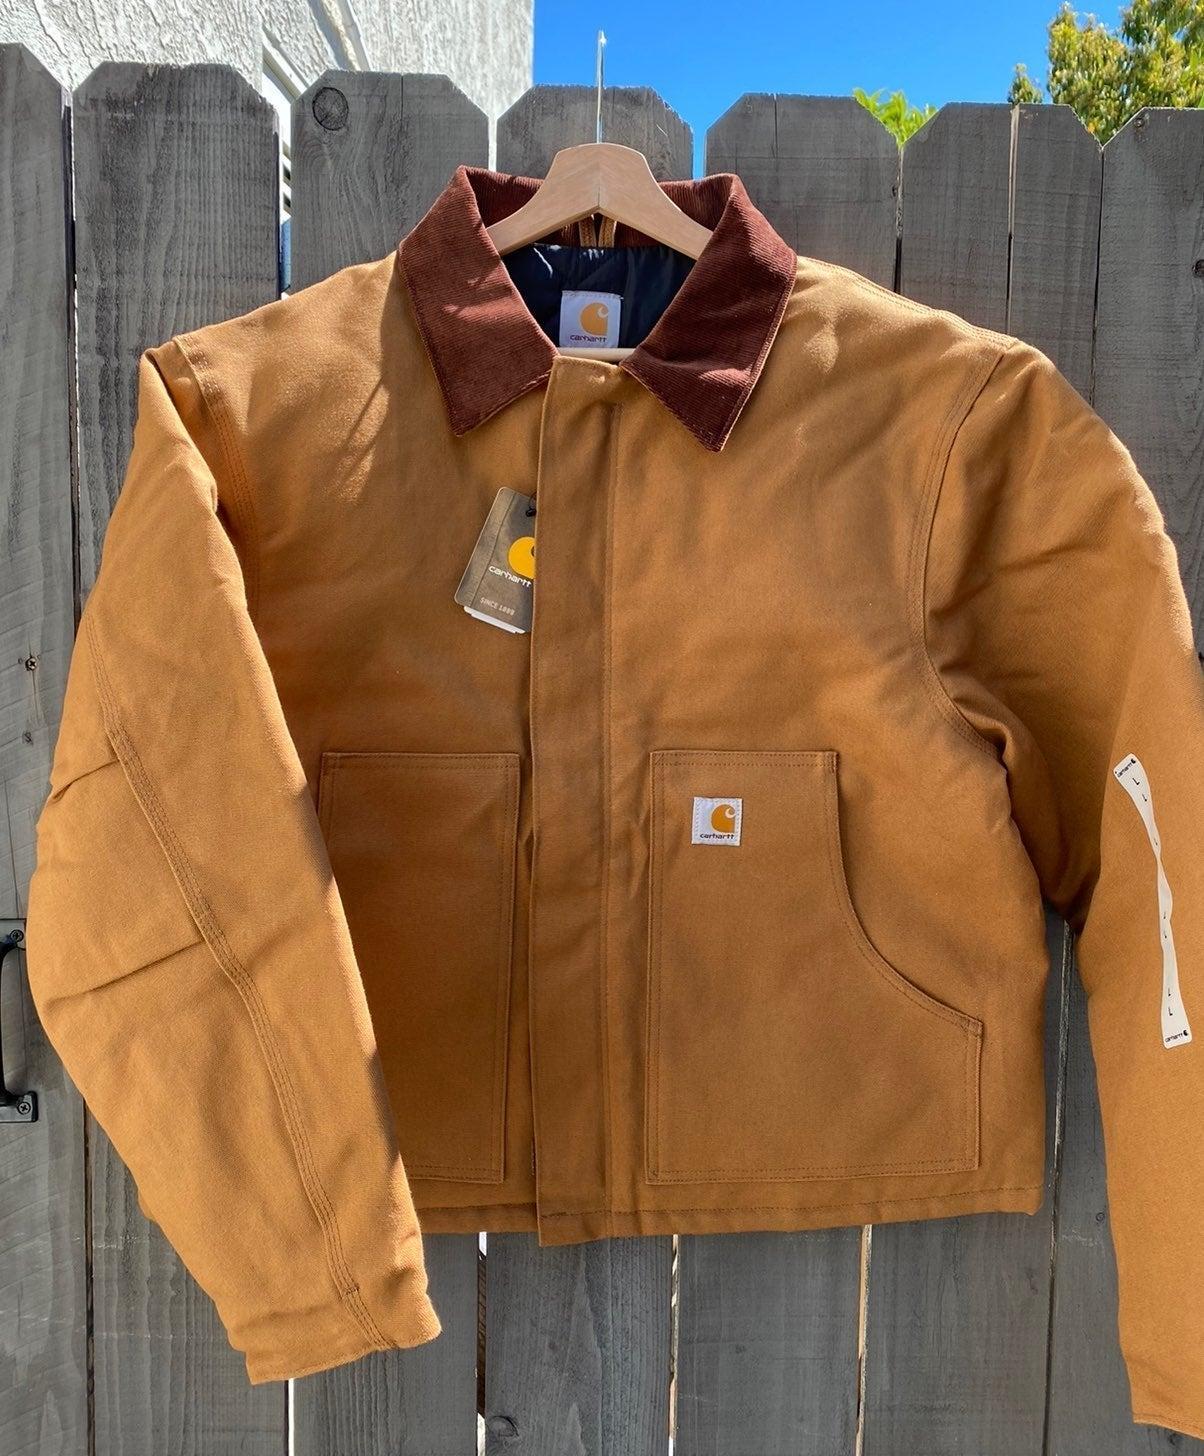 NWT Mens Carhartt J002 jacket Size Large